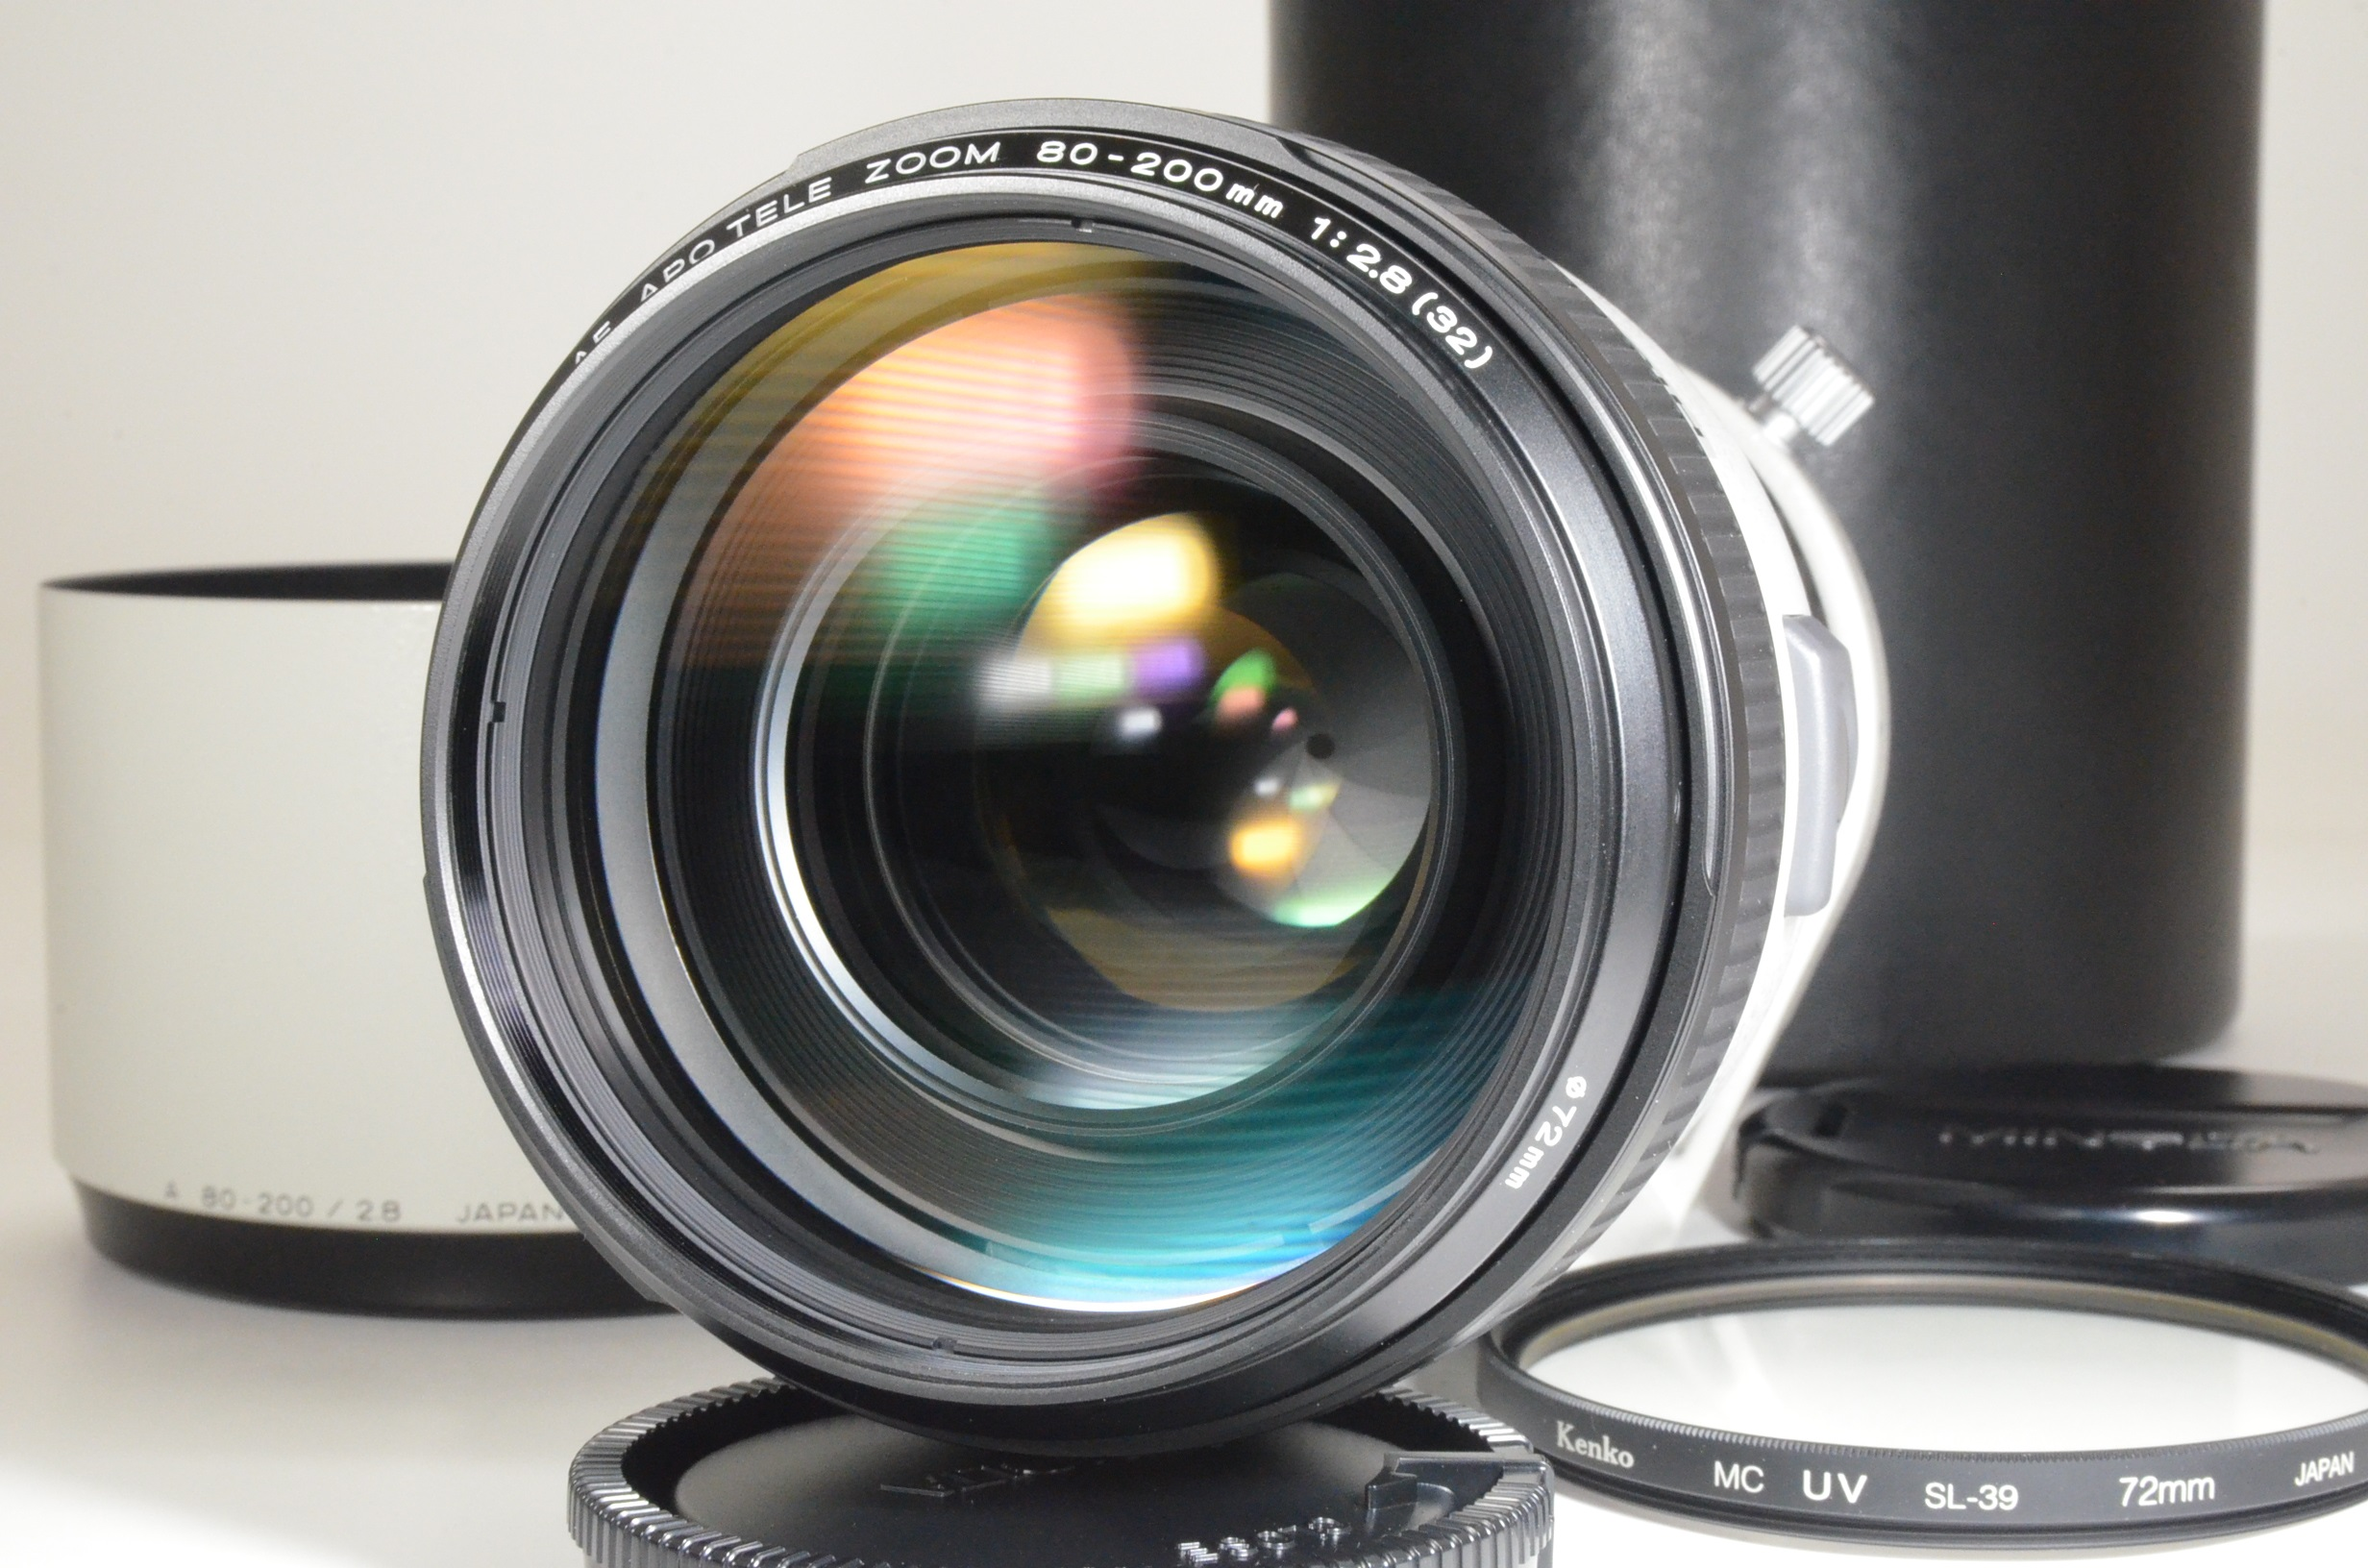 minolta high speed af apo 80-200mm f2.8 g lens sony japan w/ lens case